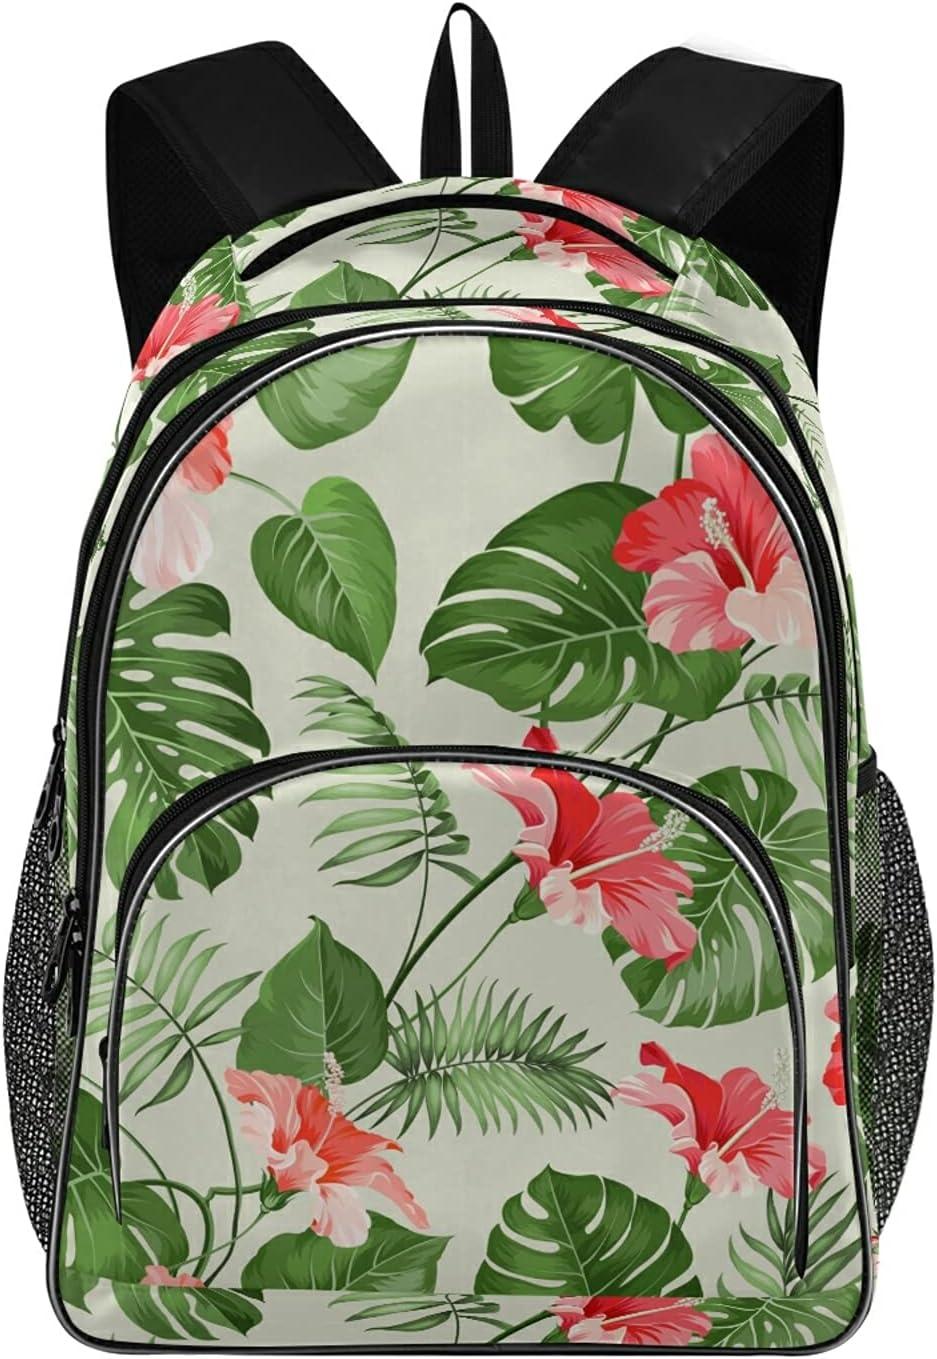 School Backpack Bookbag Laptop Daypack Super special Max 62% OFF price Schoolbag Girls for Women